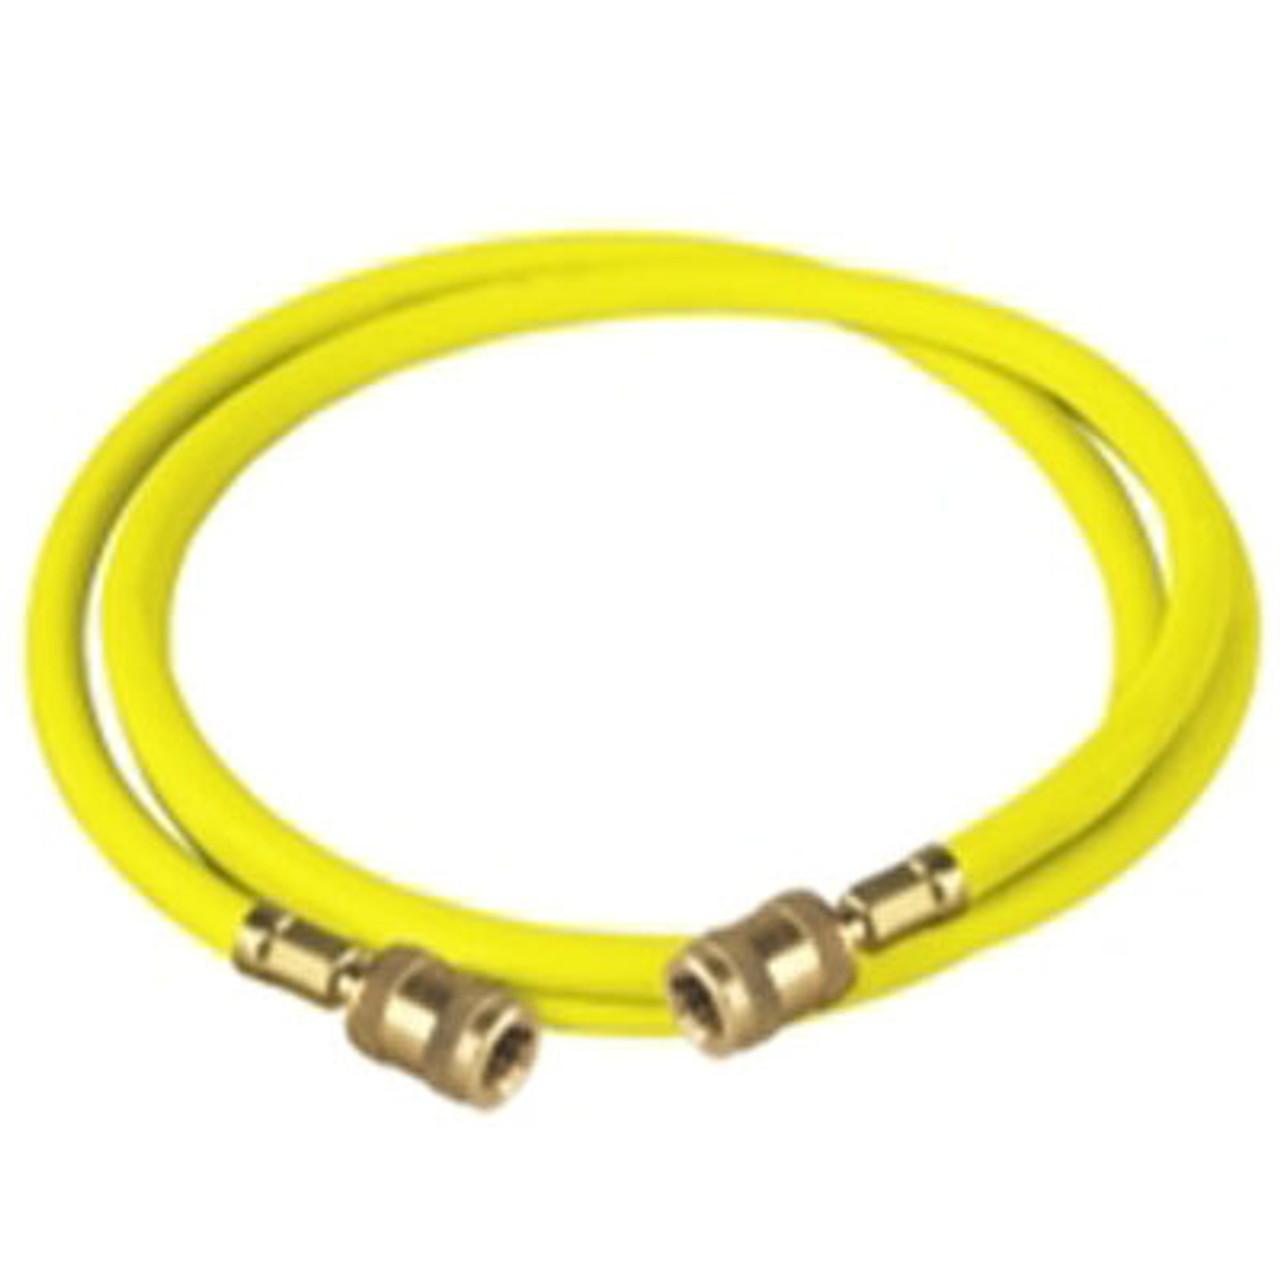 Robinair 65160 Enviro-Guard Yellow 60 Hose with Ball Valve